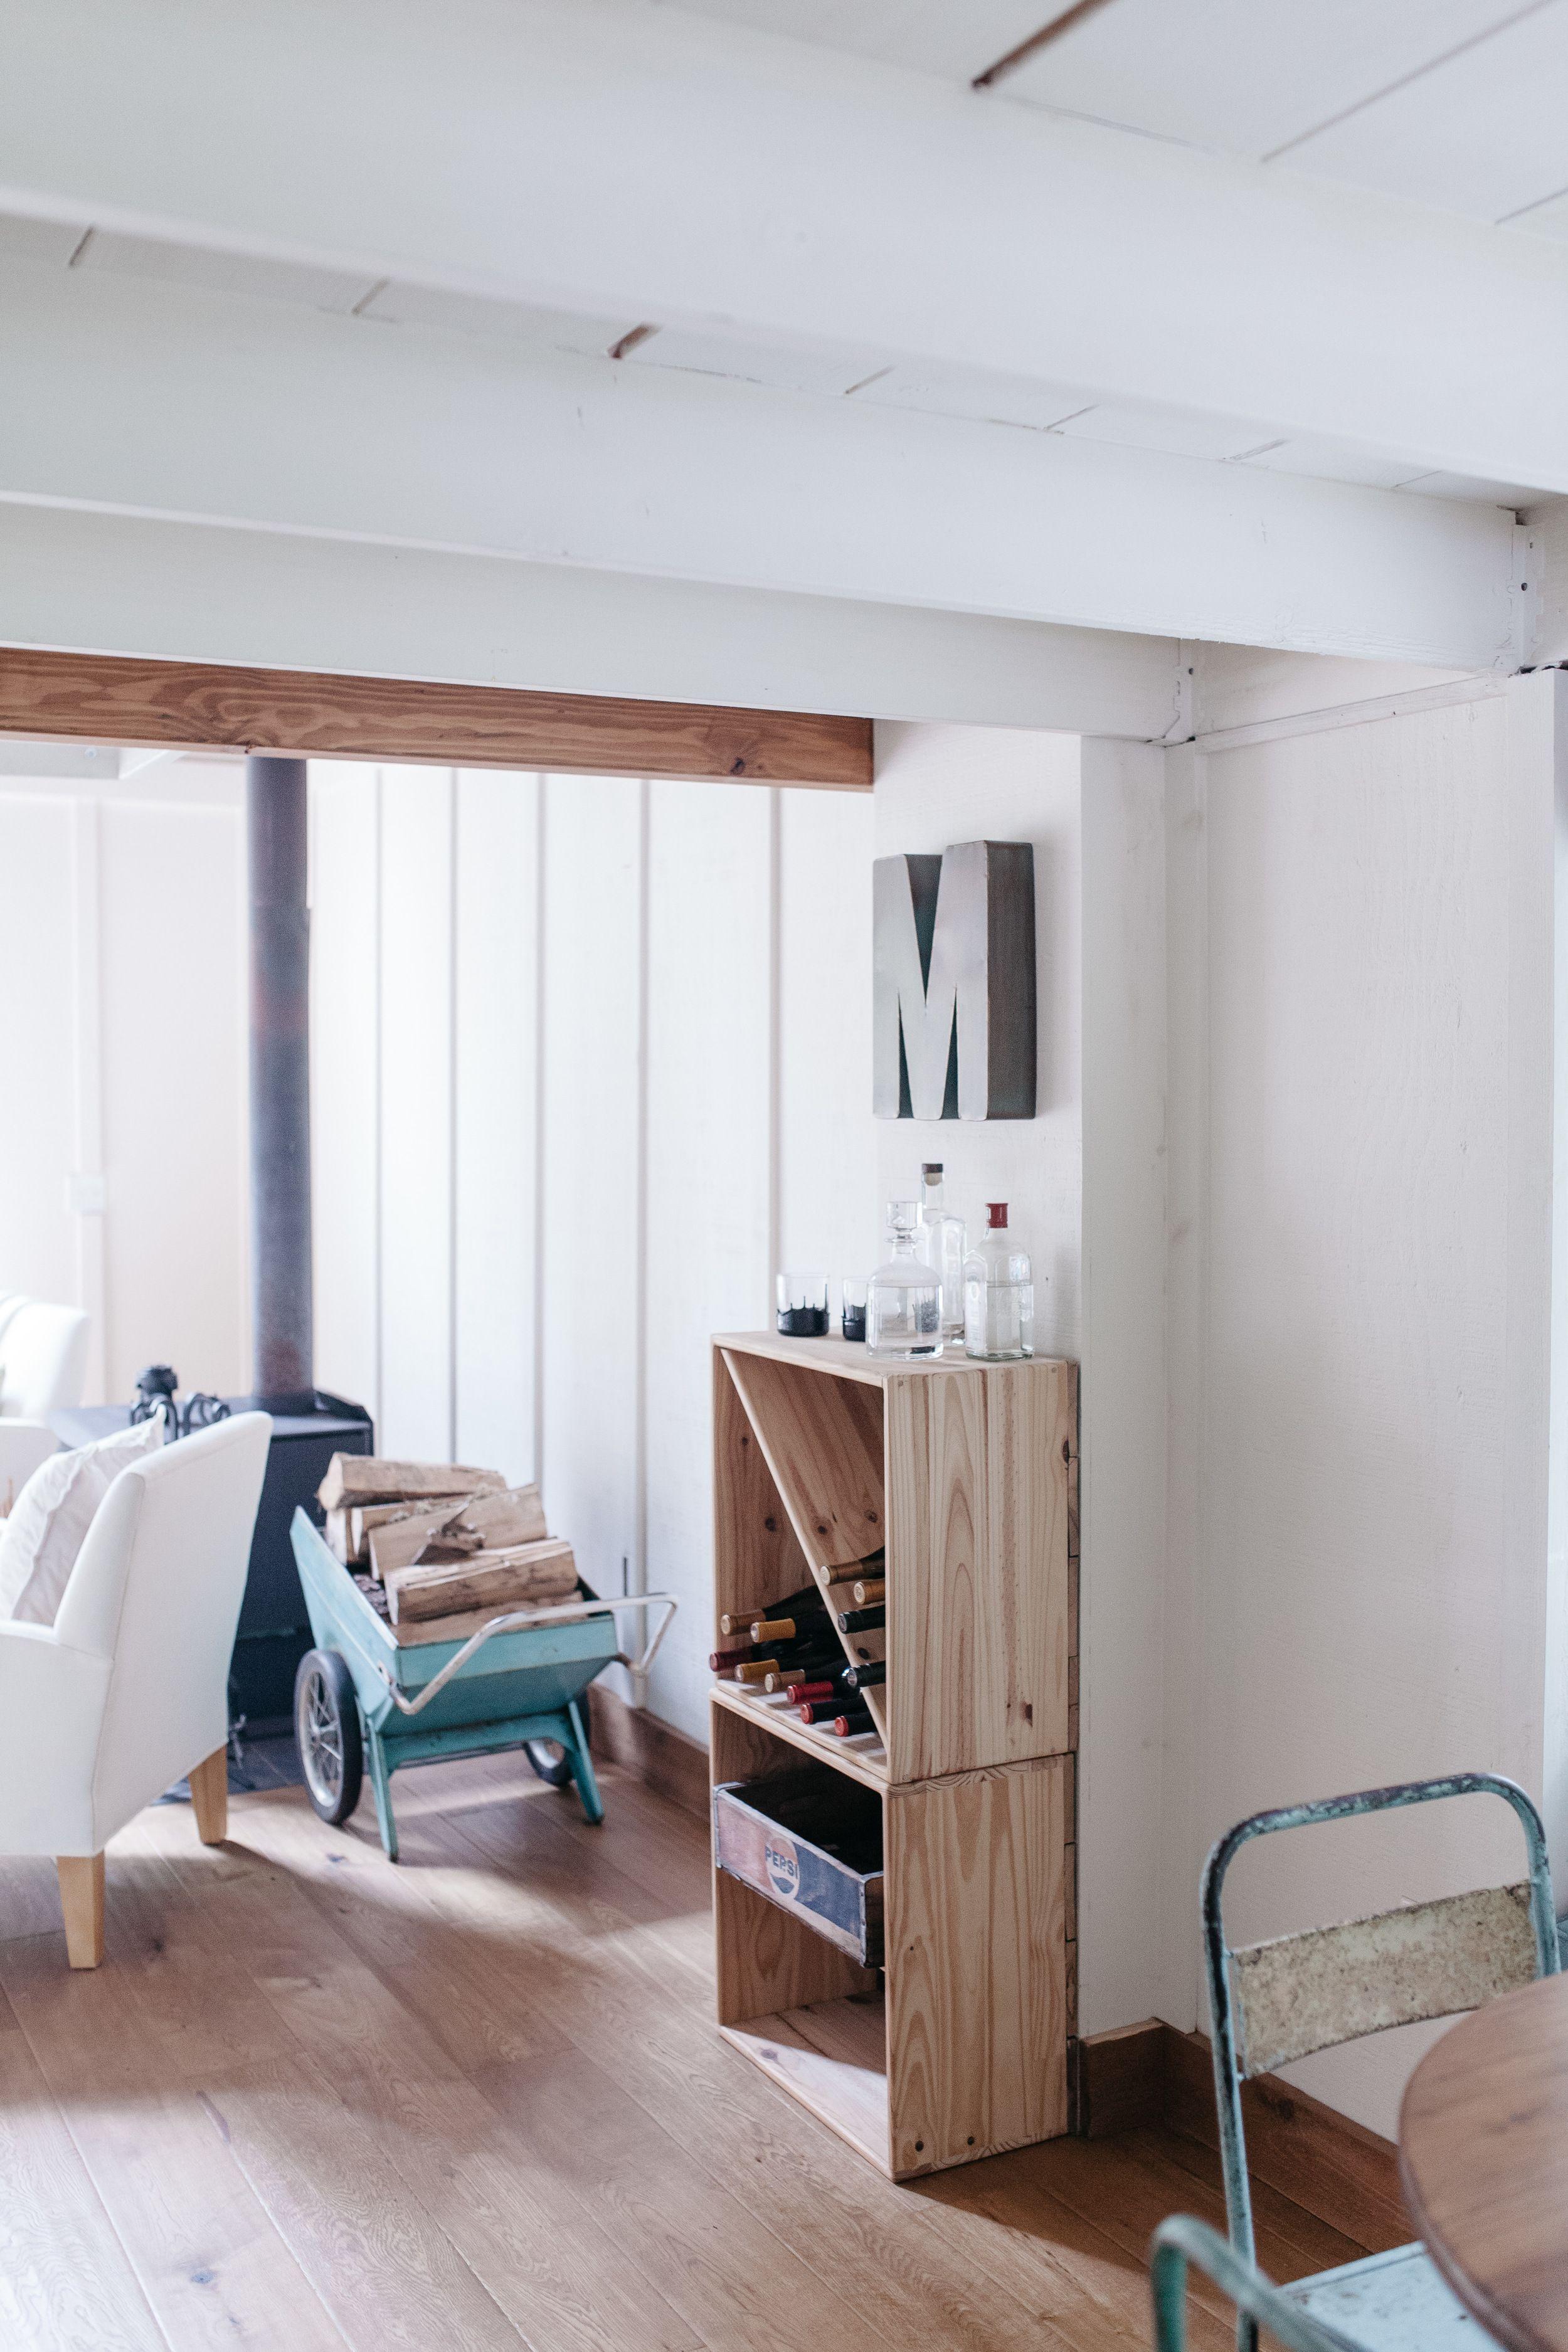 Moss Design Co Cottage Pinterest Residential interior design